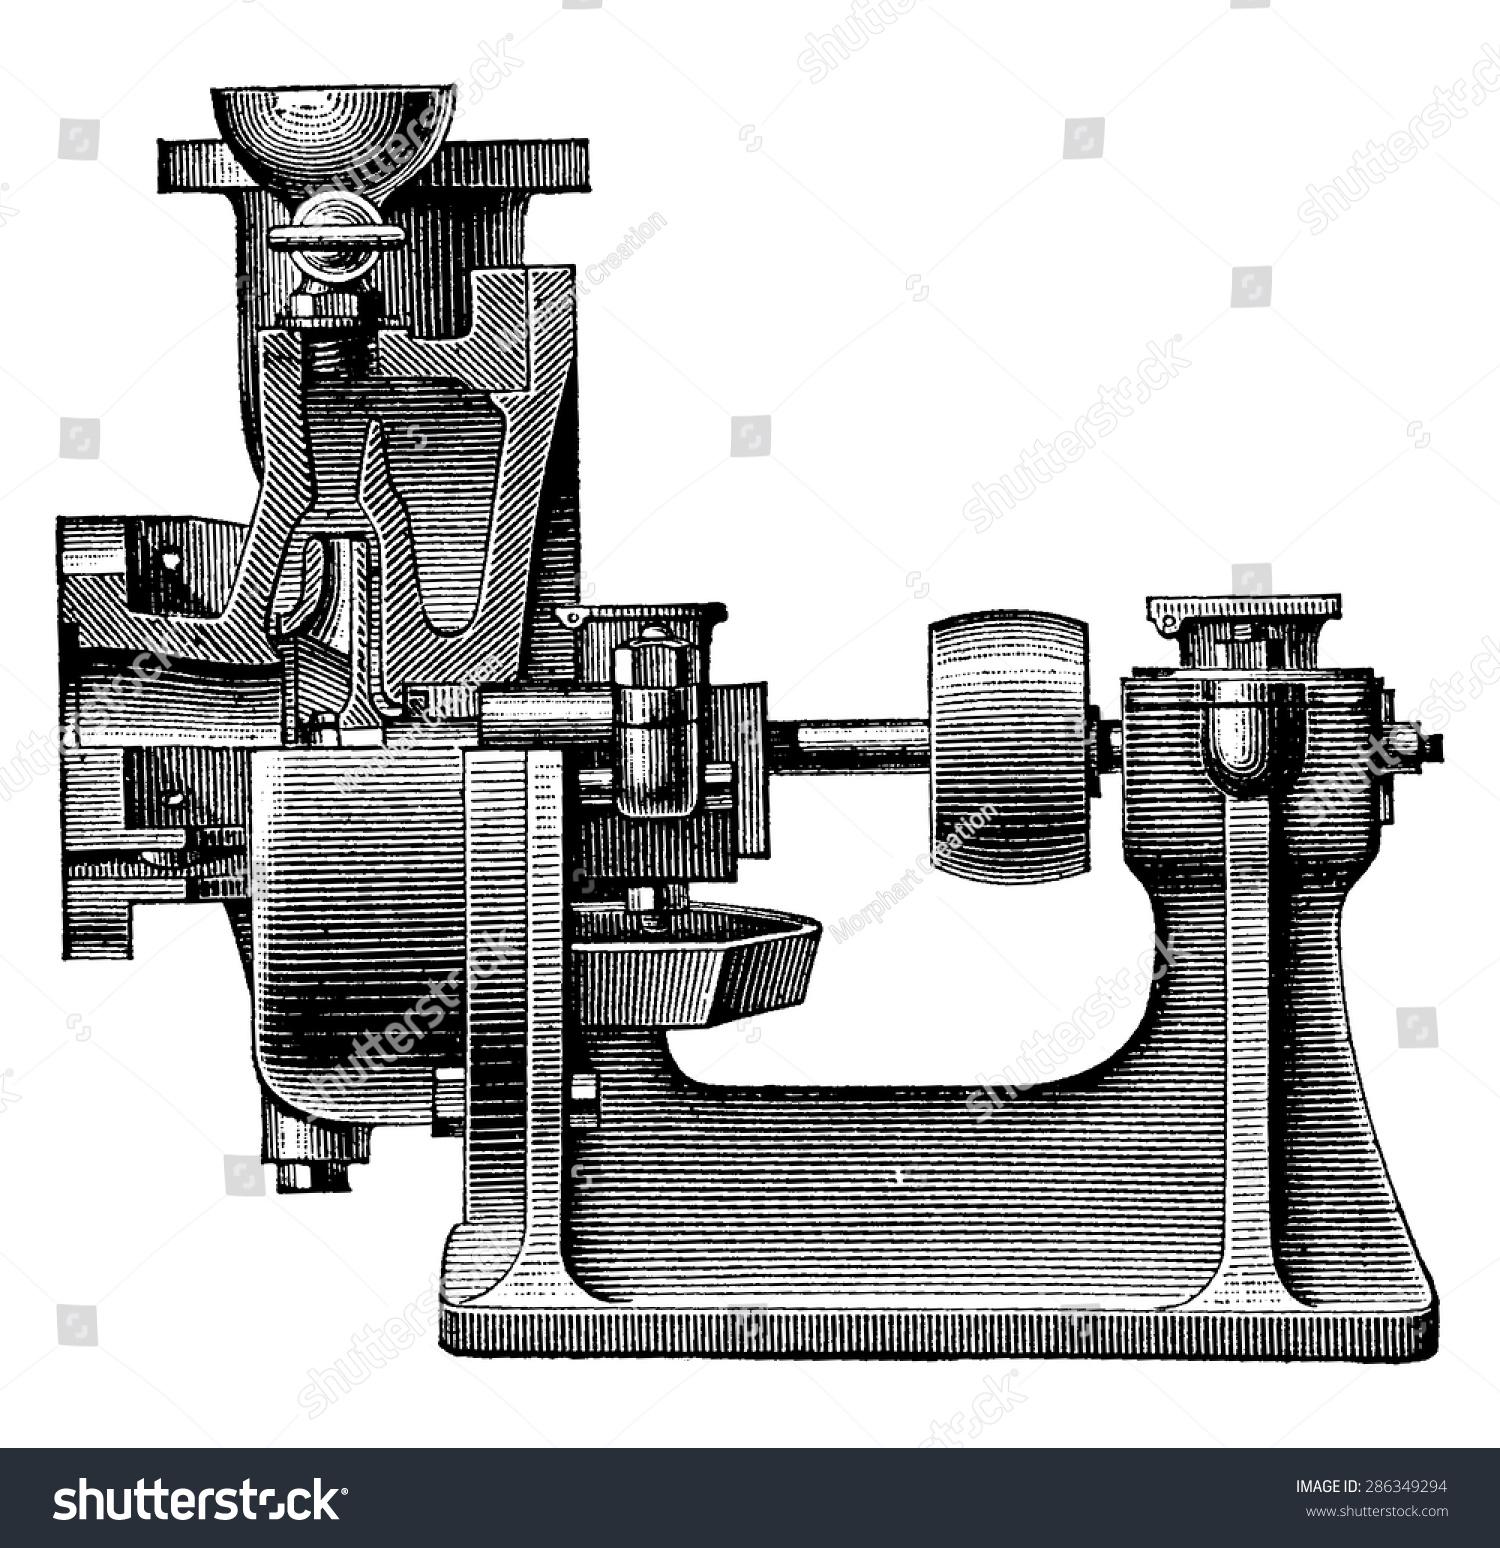 hight resolution of heart centrifugal pump vintage engraved illustration industrial encyclopedia e o lami 1875